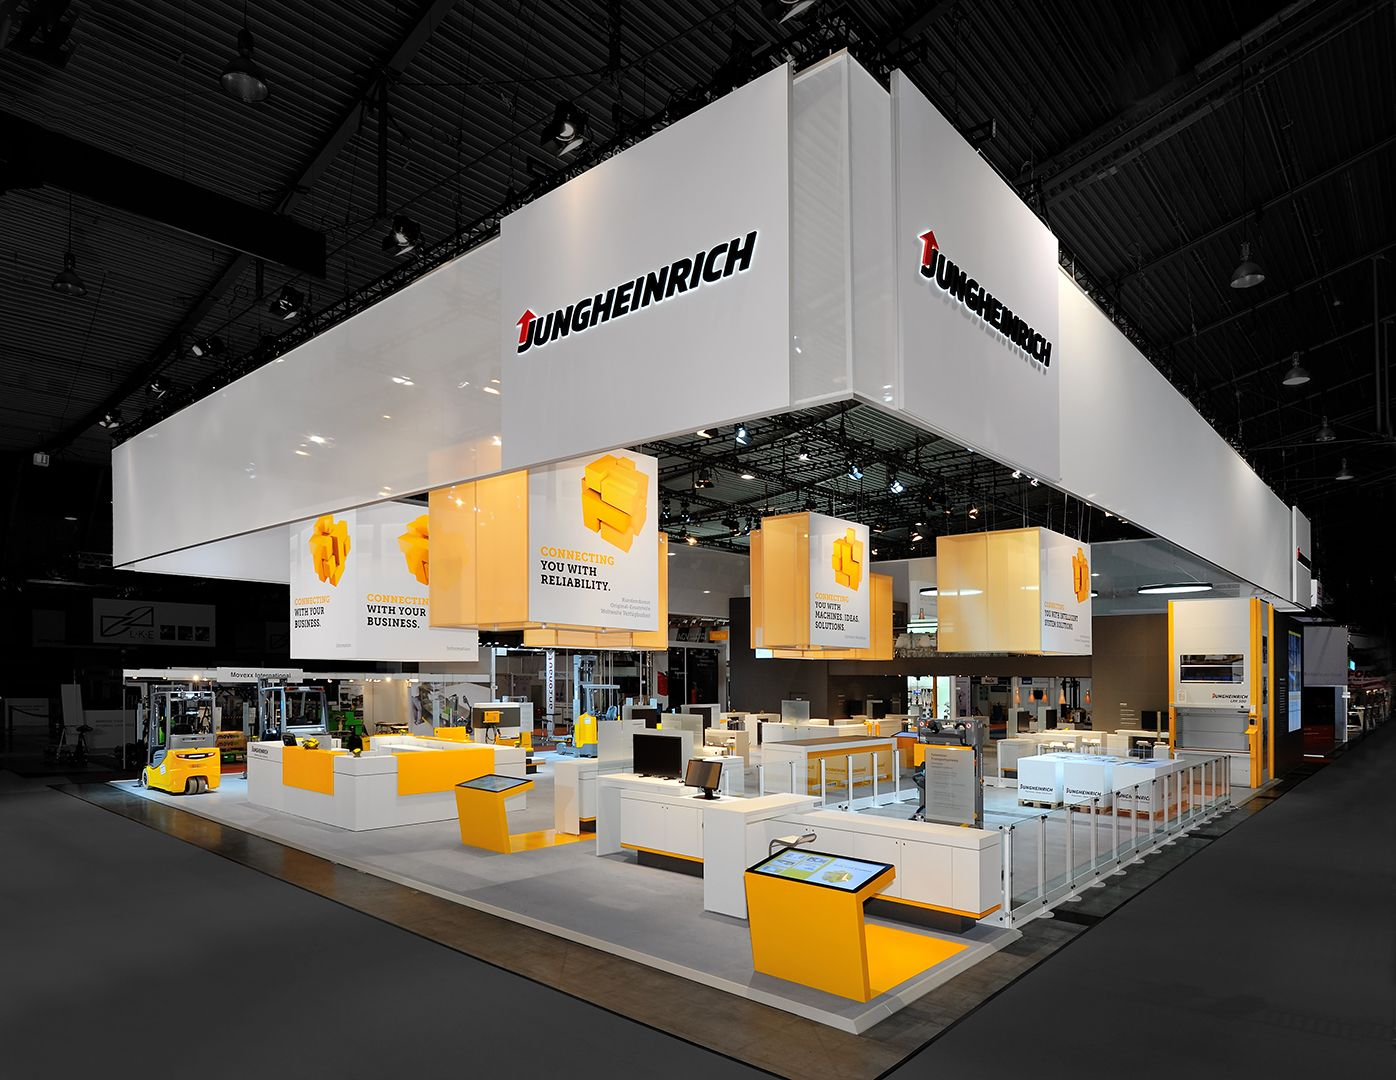 D Exhibition Booth Design Software : Jungheinrich größter aussteller auf der logimat walbert